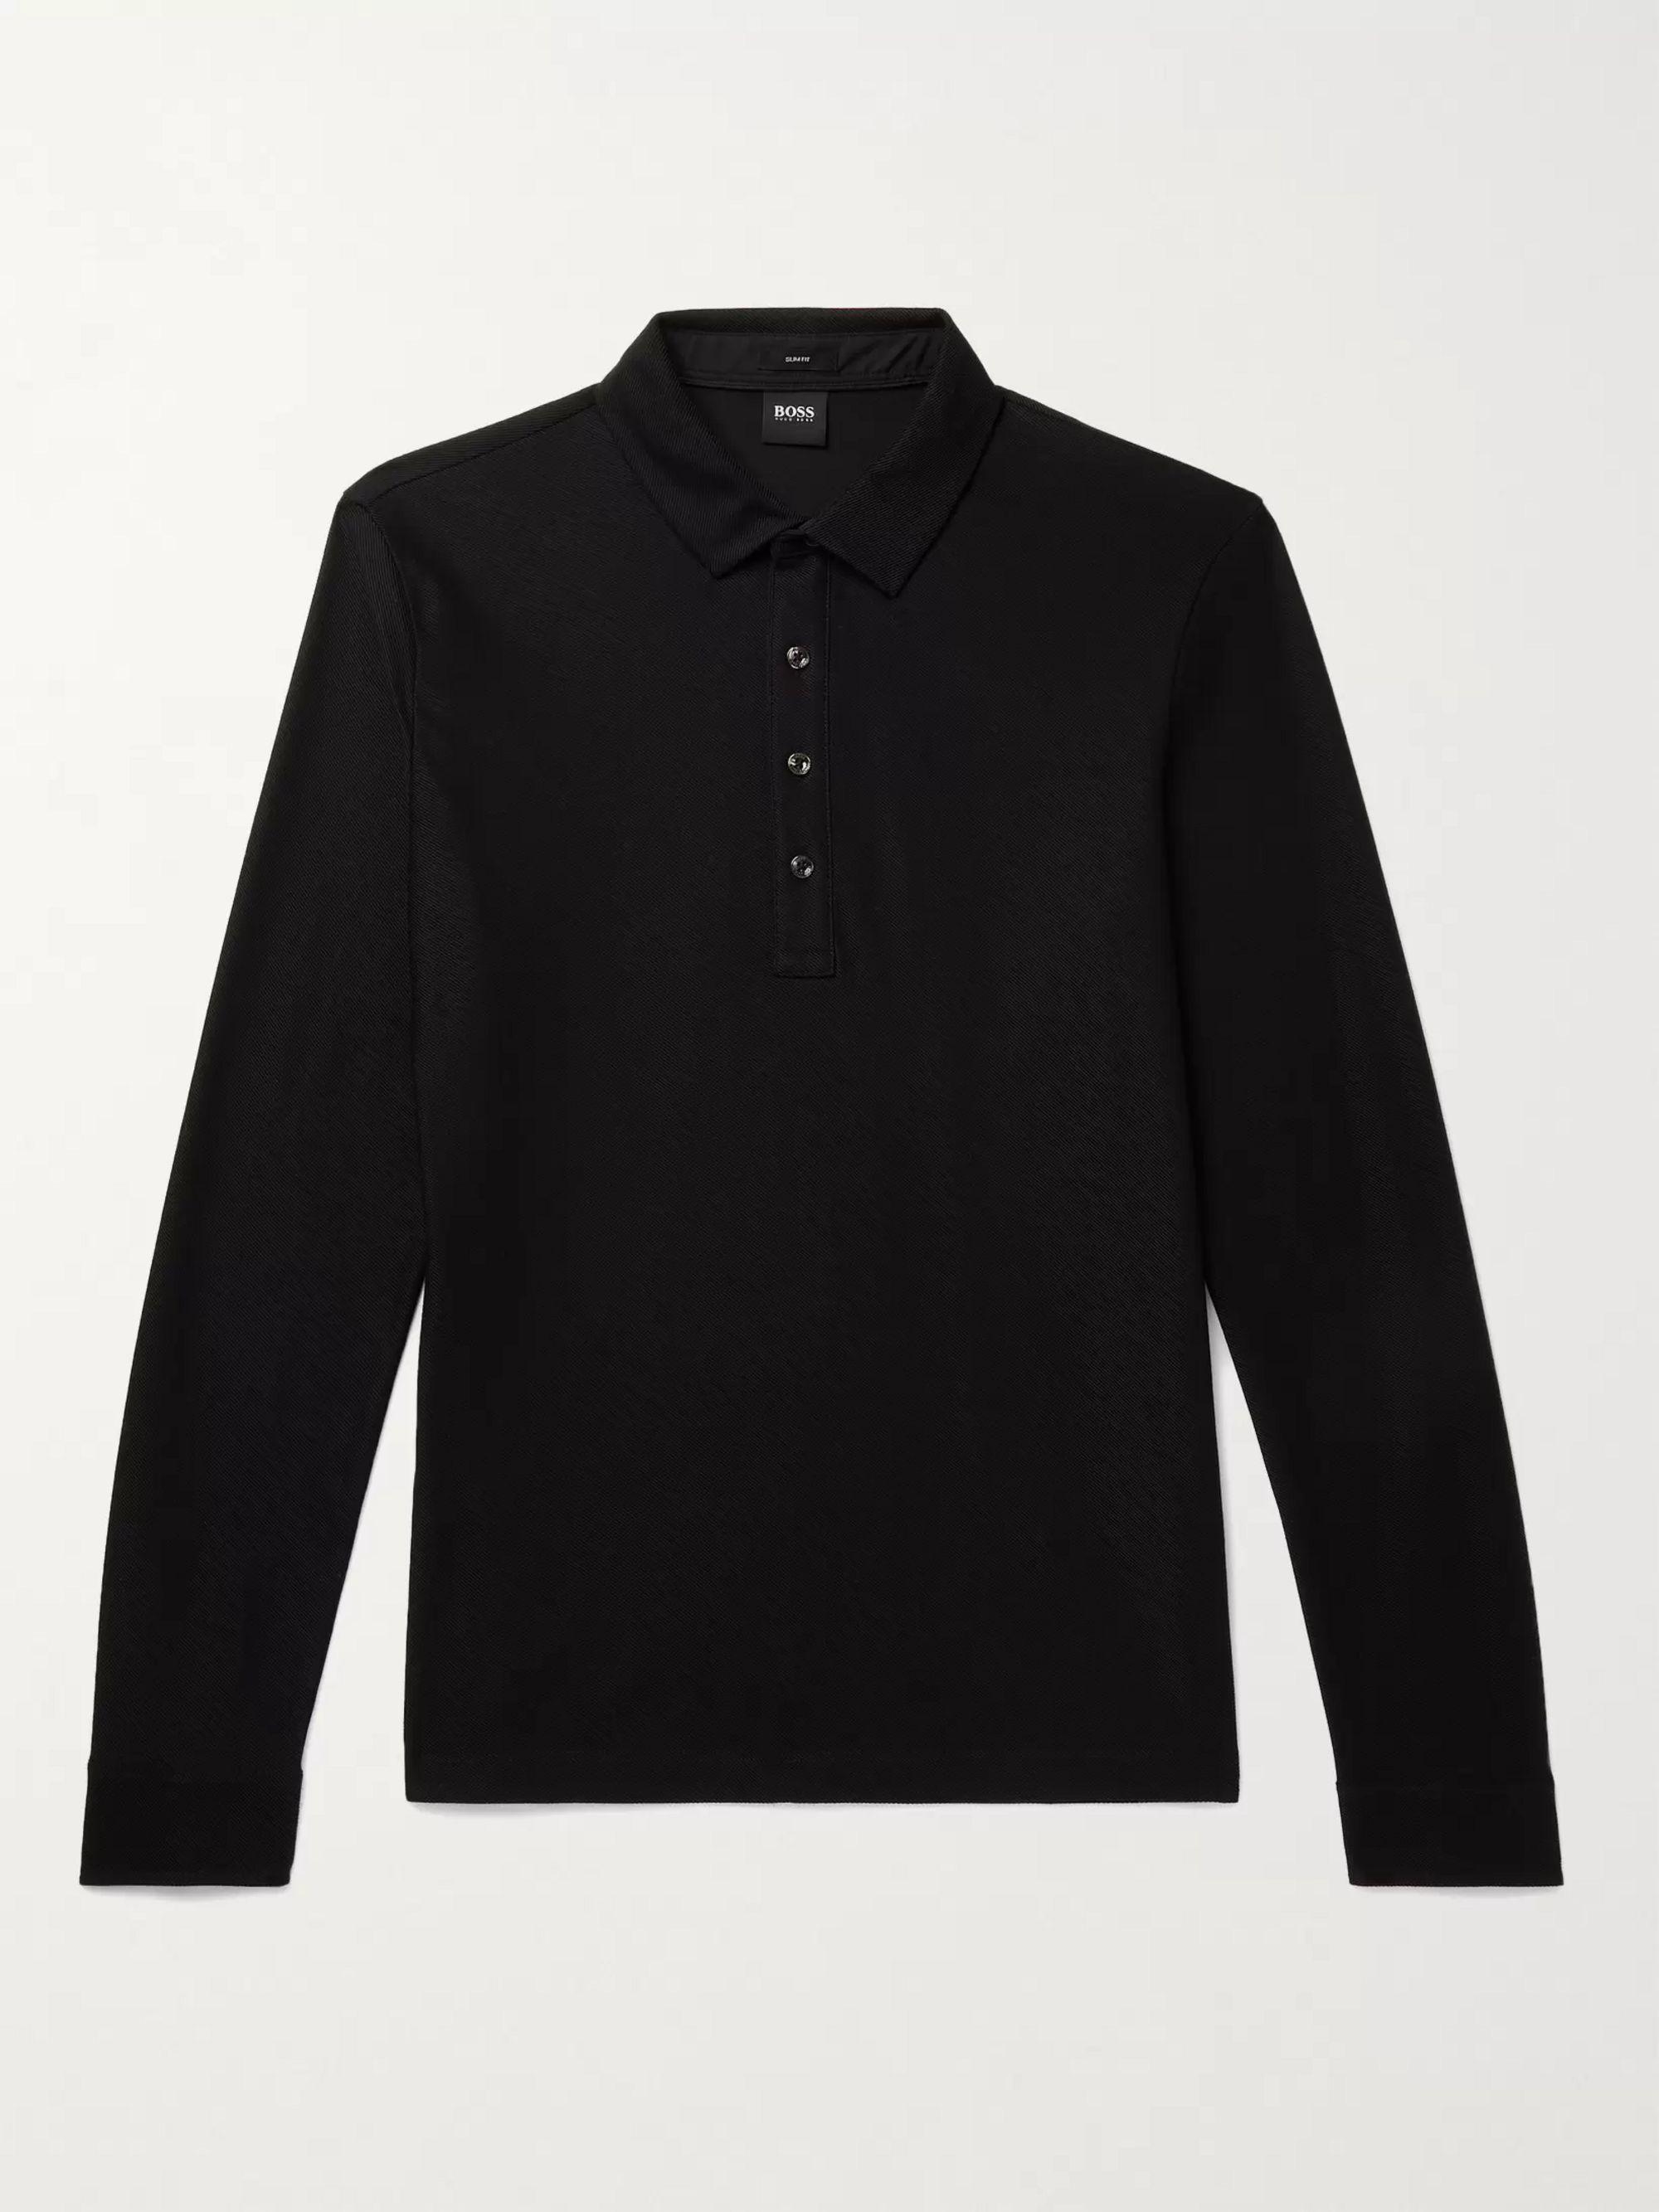 HUGO BOSS Slim Fit Cotton Polo Shirt